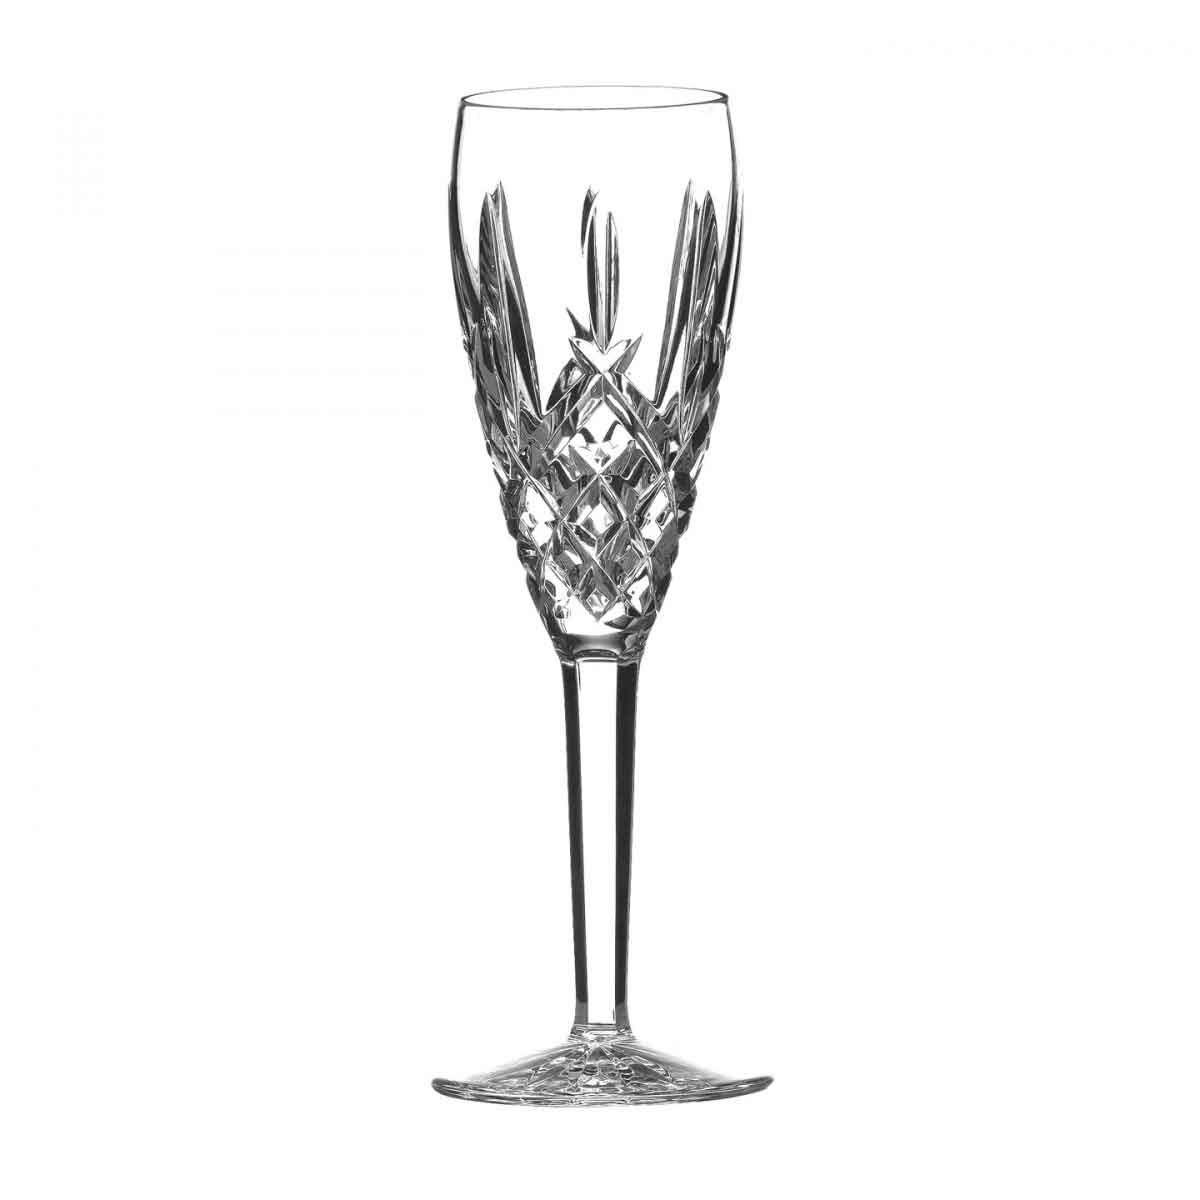 Waterford Crystal, Araglin Crystal Flute Crystal Champagne, Single